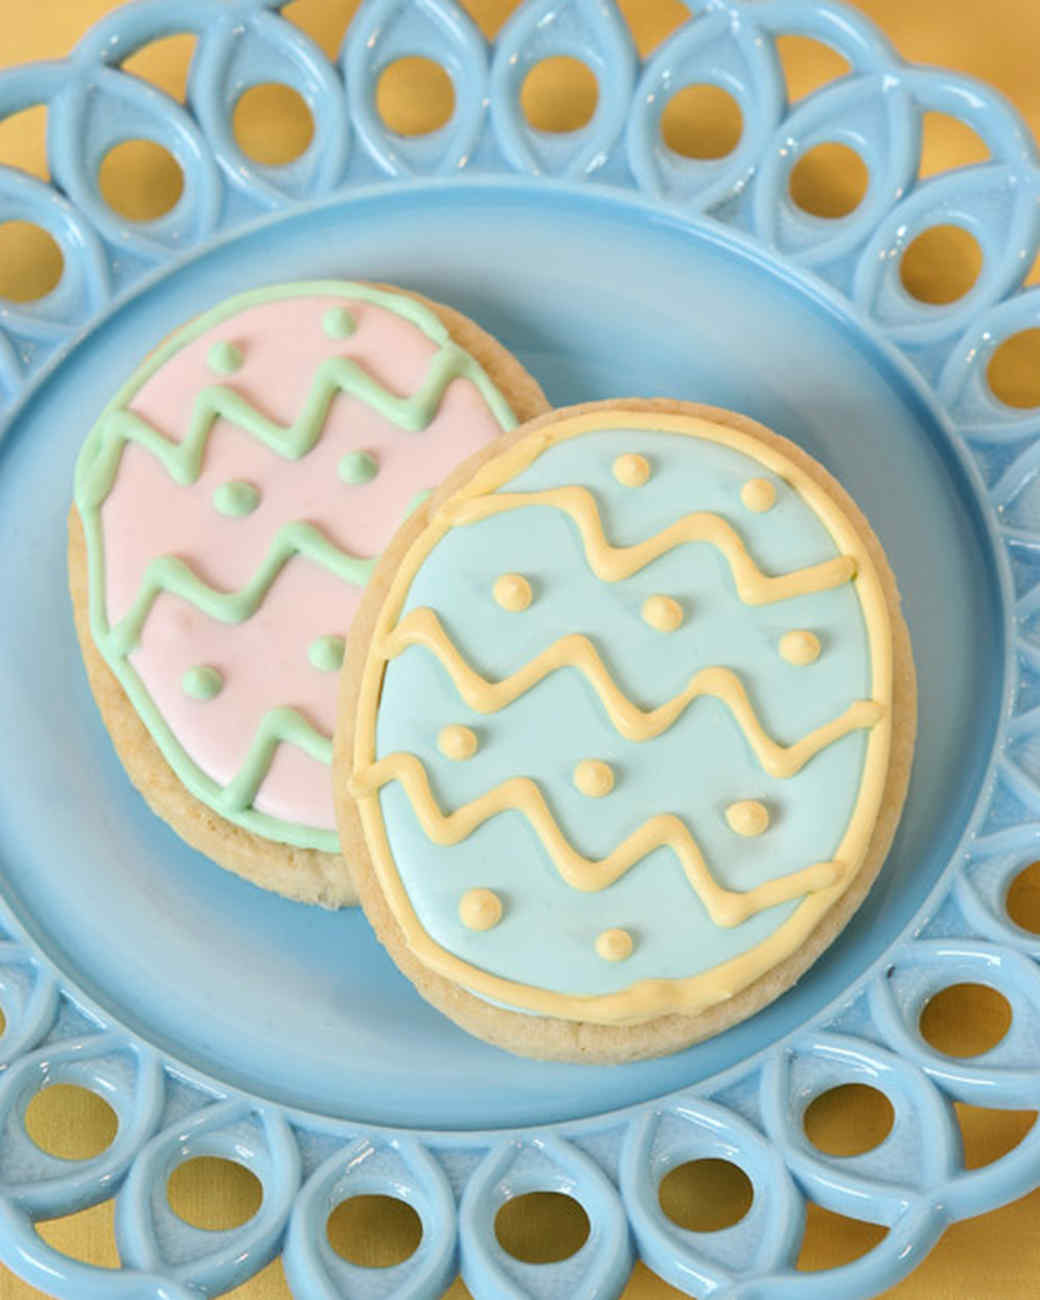 Royal Icing Recipe For Sugar Cookies  Ideal Sugar Cookies Recipe & Video